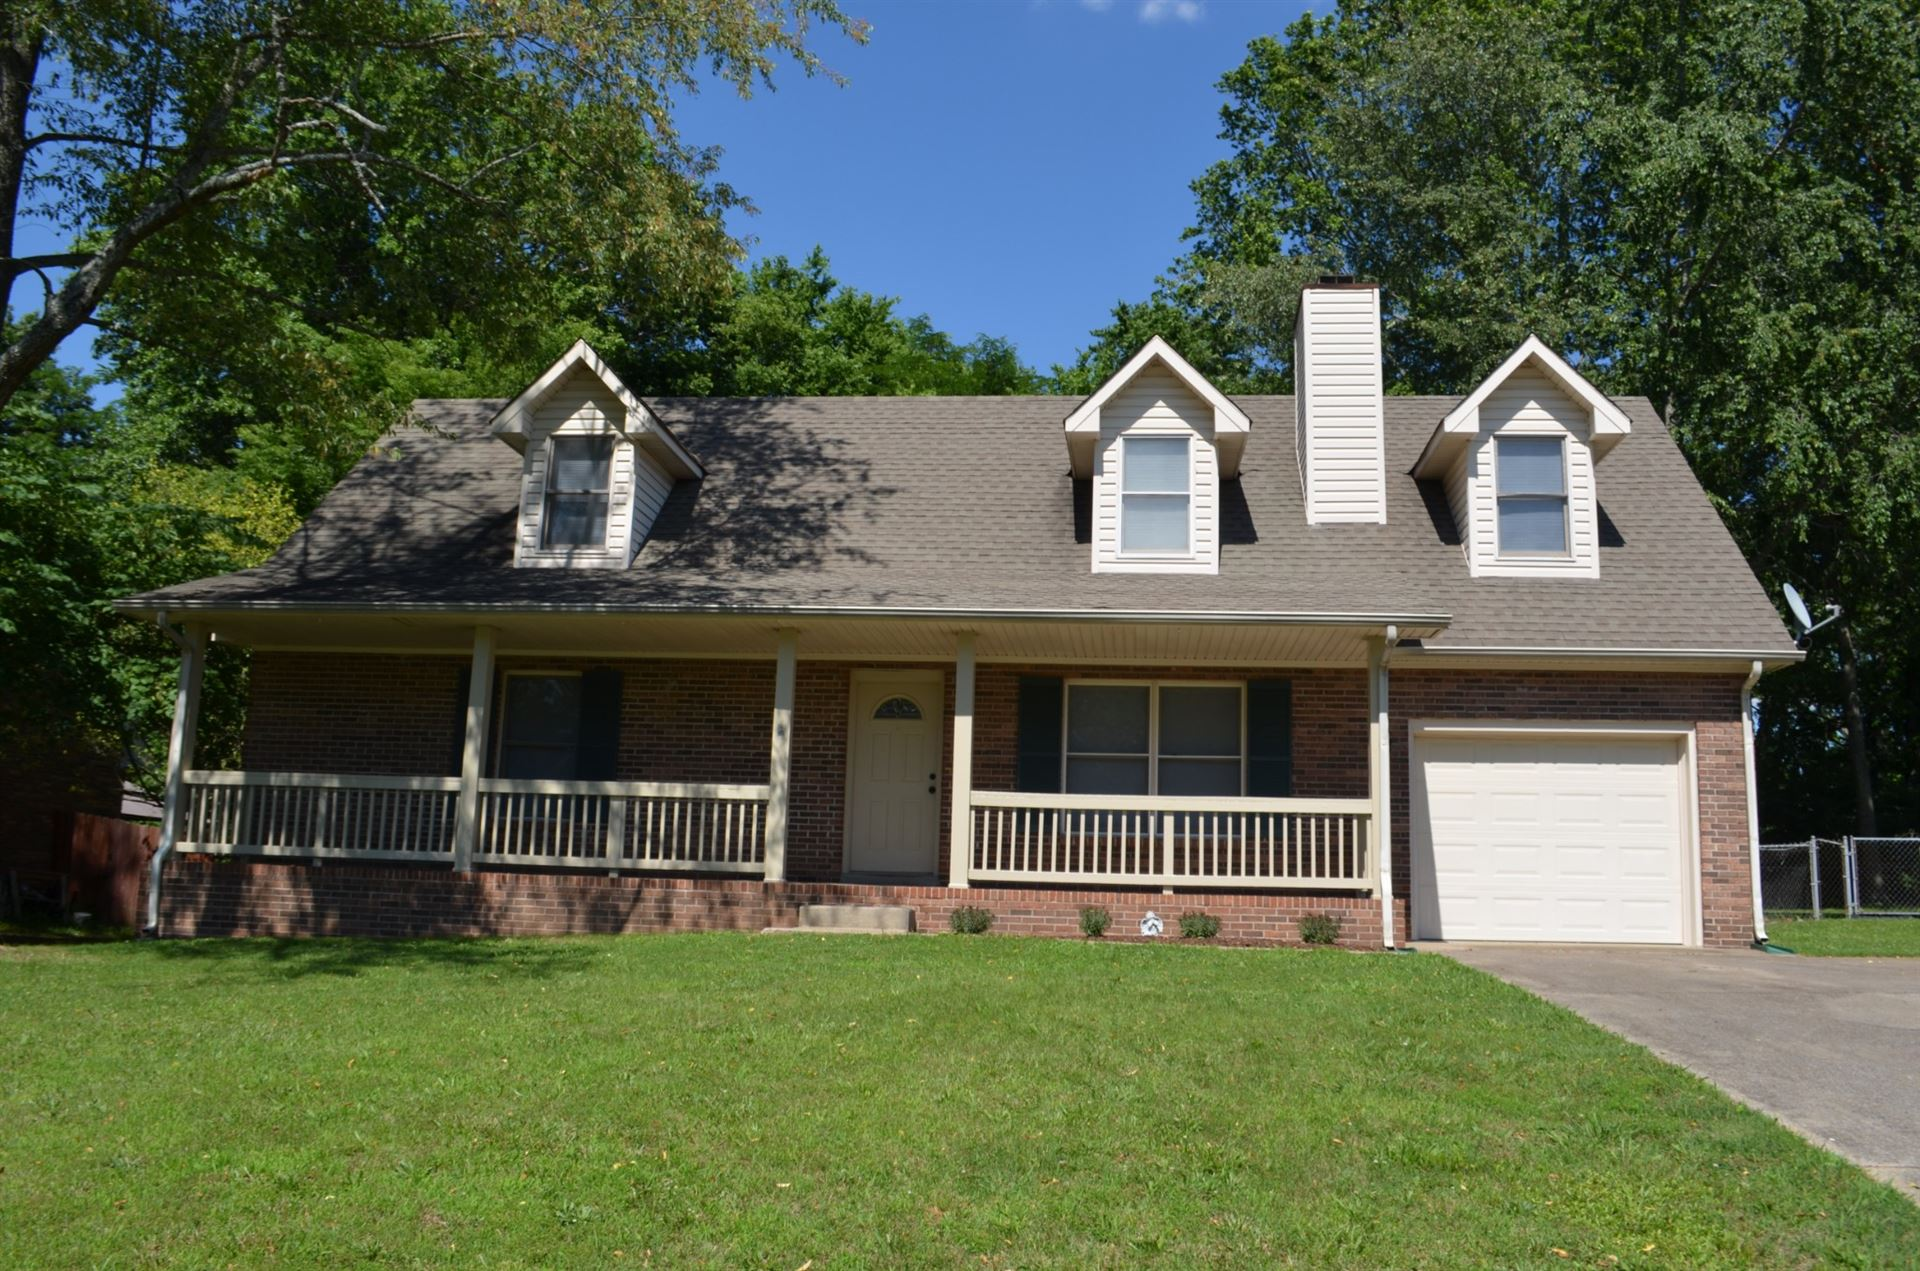 Photo of 1169 Woodbridge Dr, Clarksville, TN 37042 (MLS # 2263483)